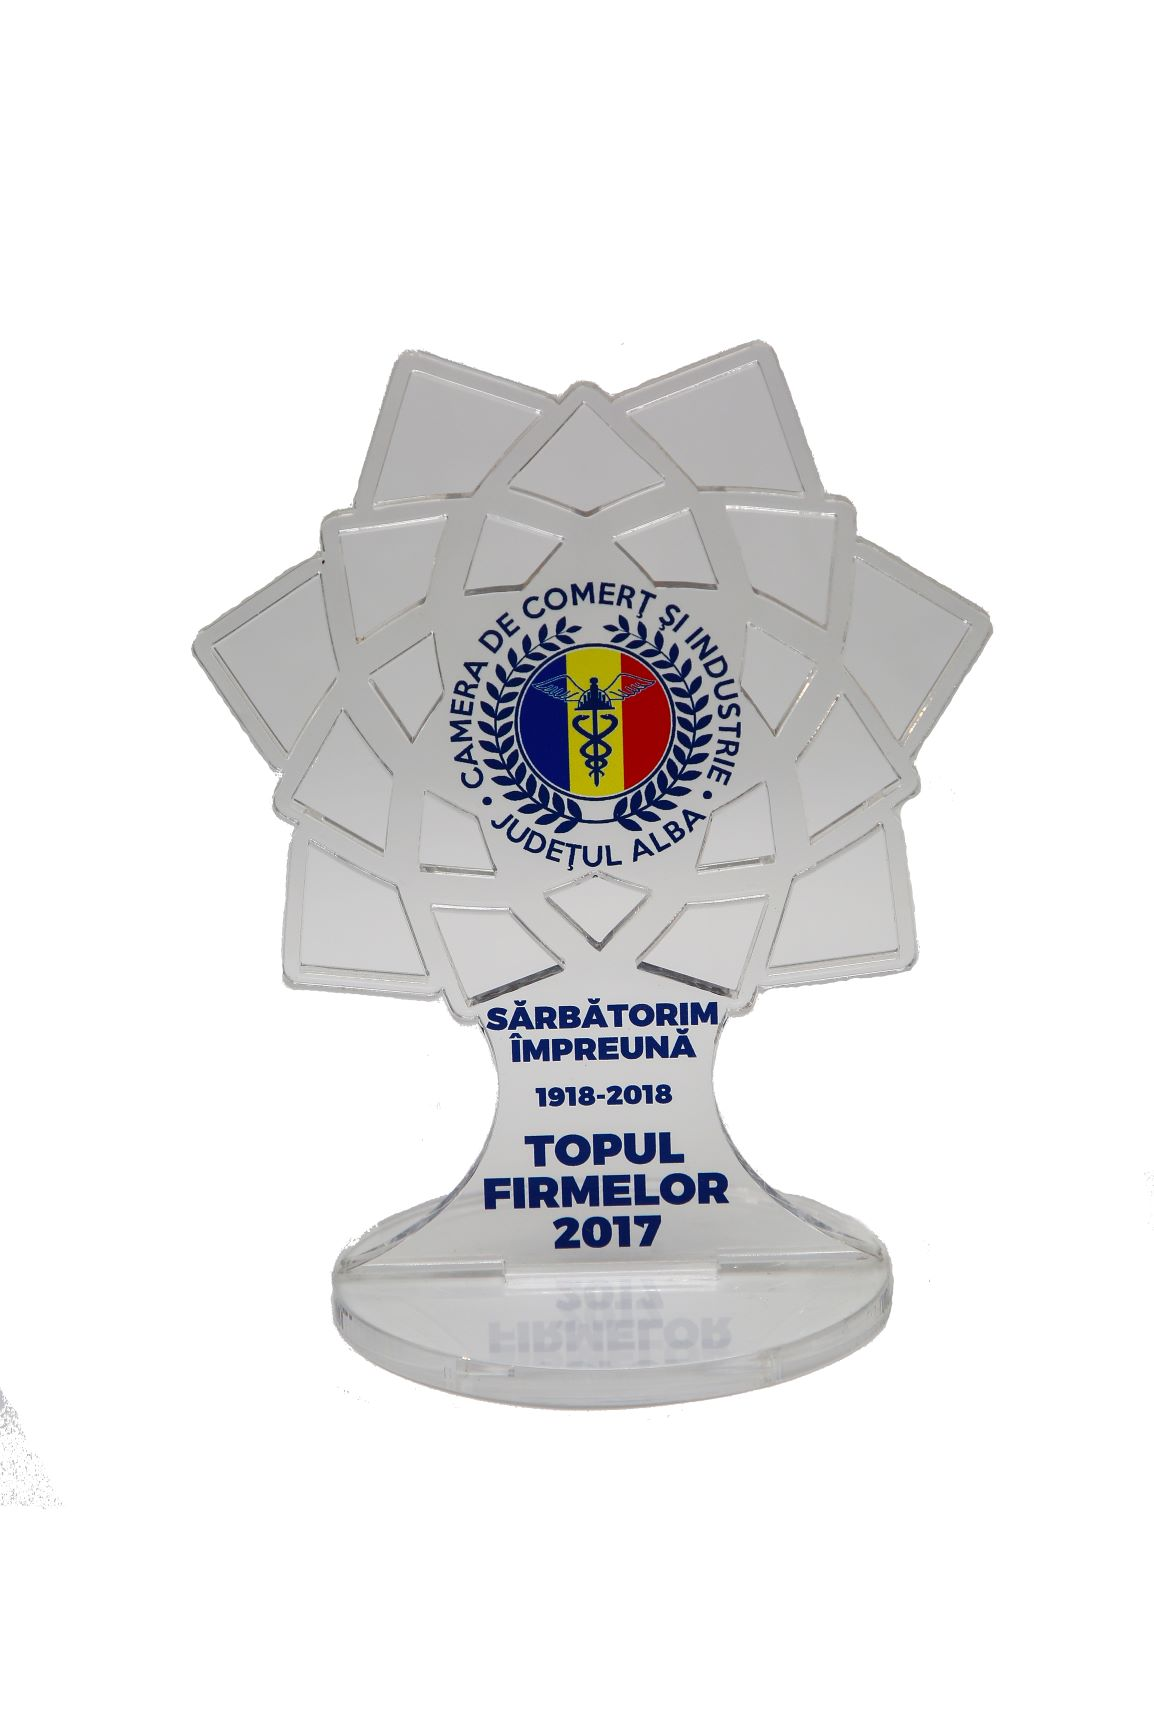 TOPUL FIRMELOR CAMERA DE COMERT ALBA